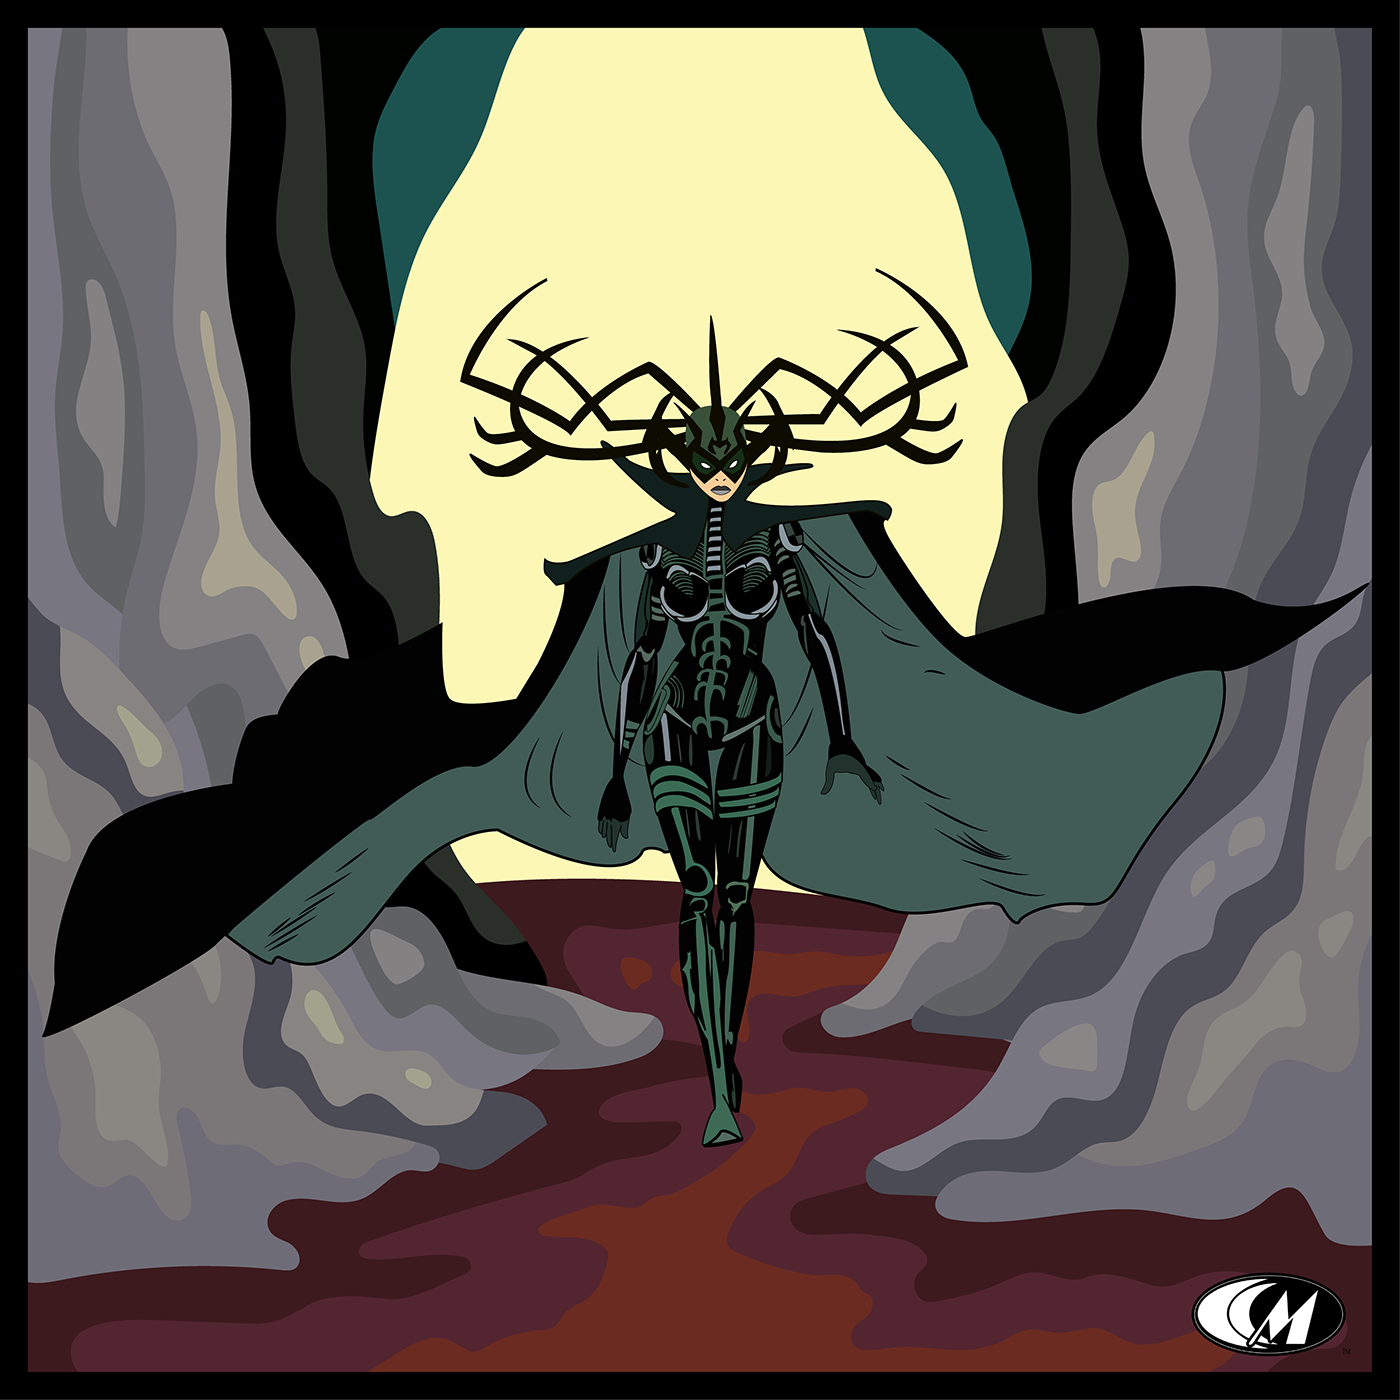 ILLUSTRATION  Digital Art  graphic design  death Thor goddess marvel blood asgard